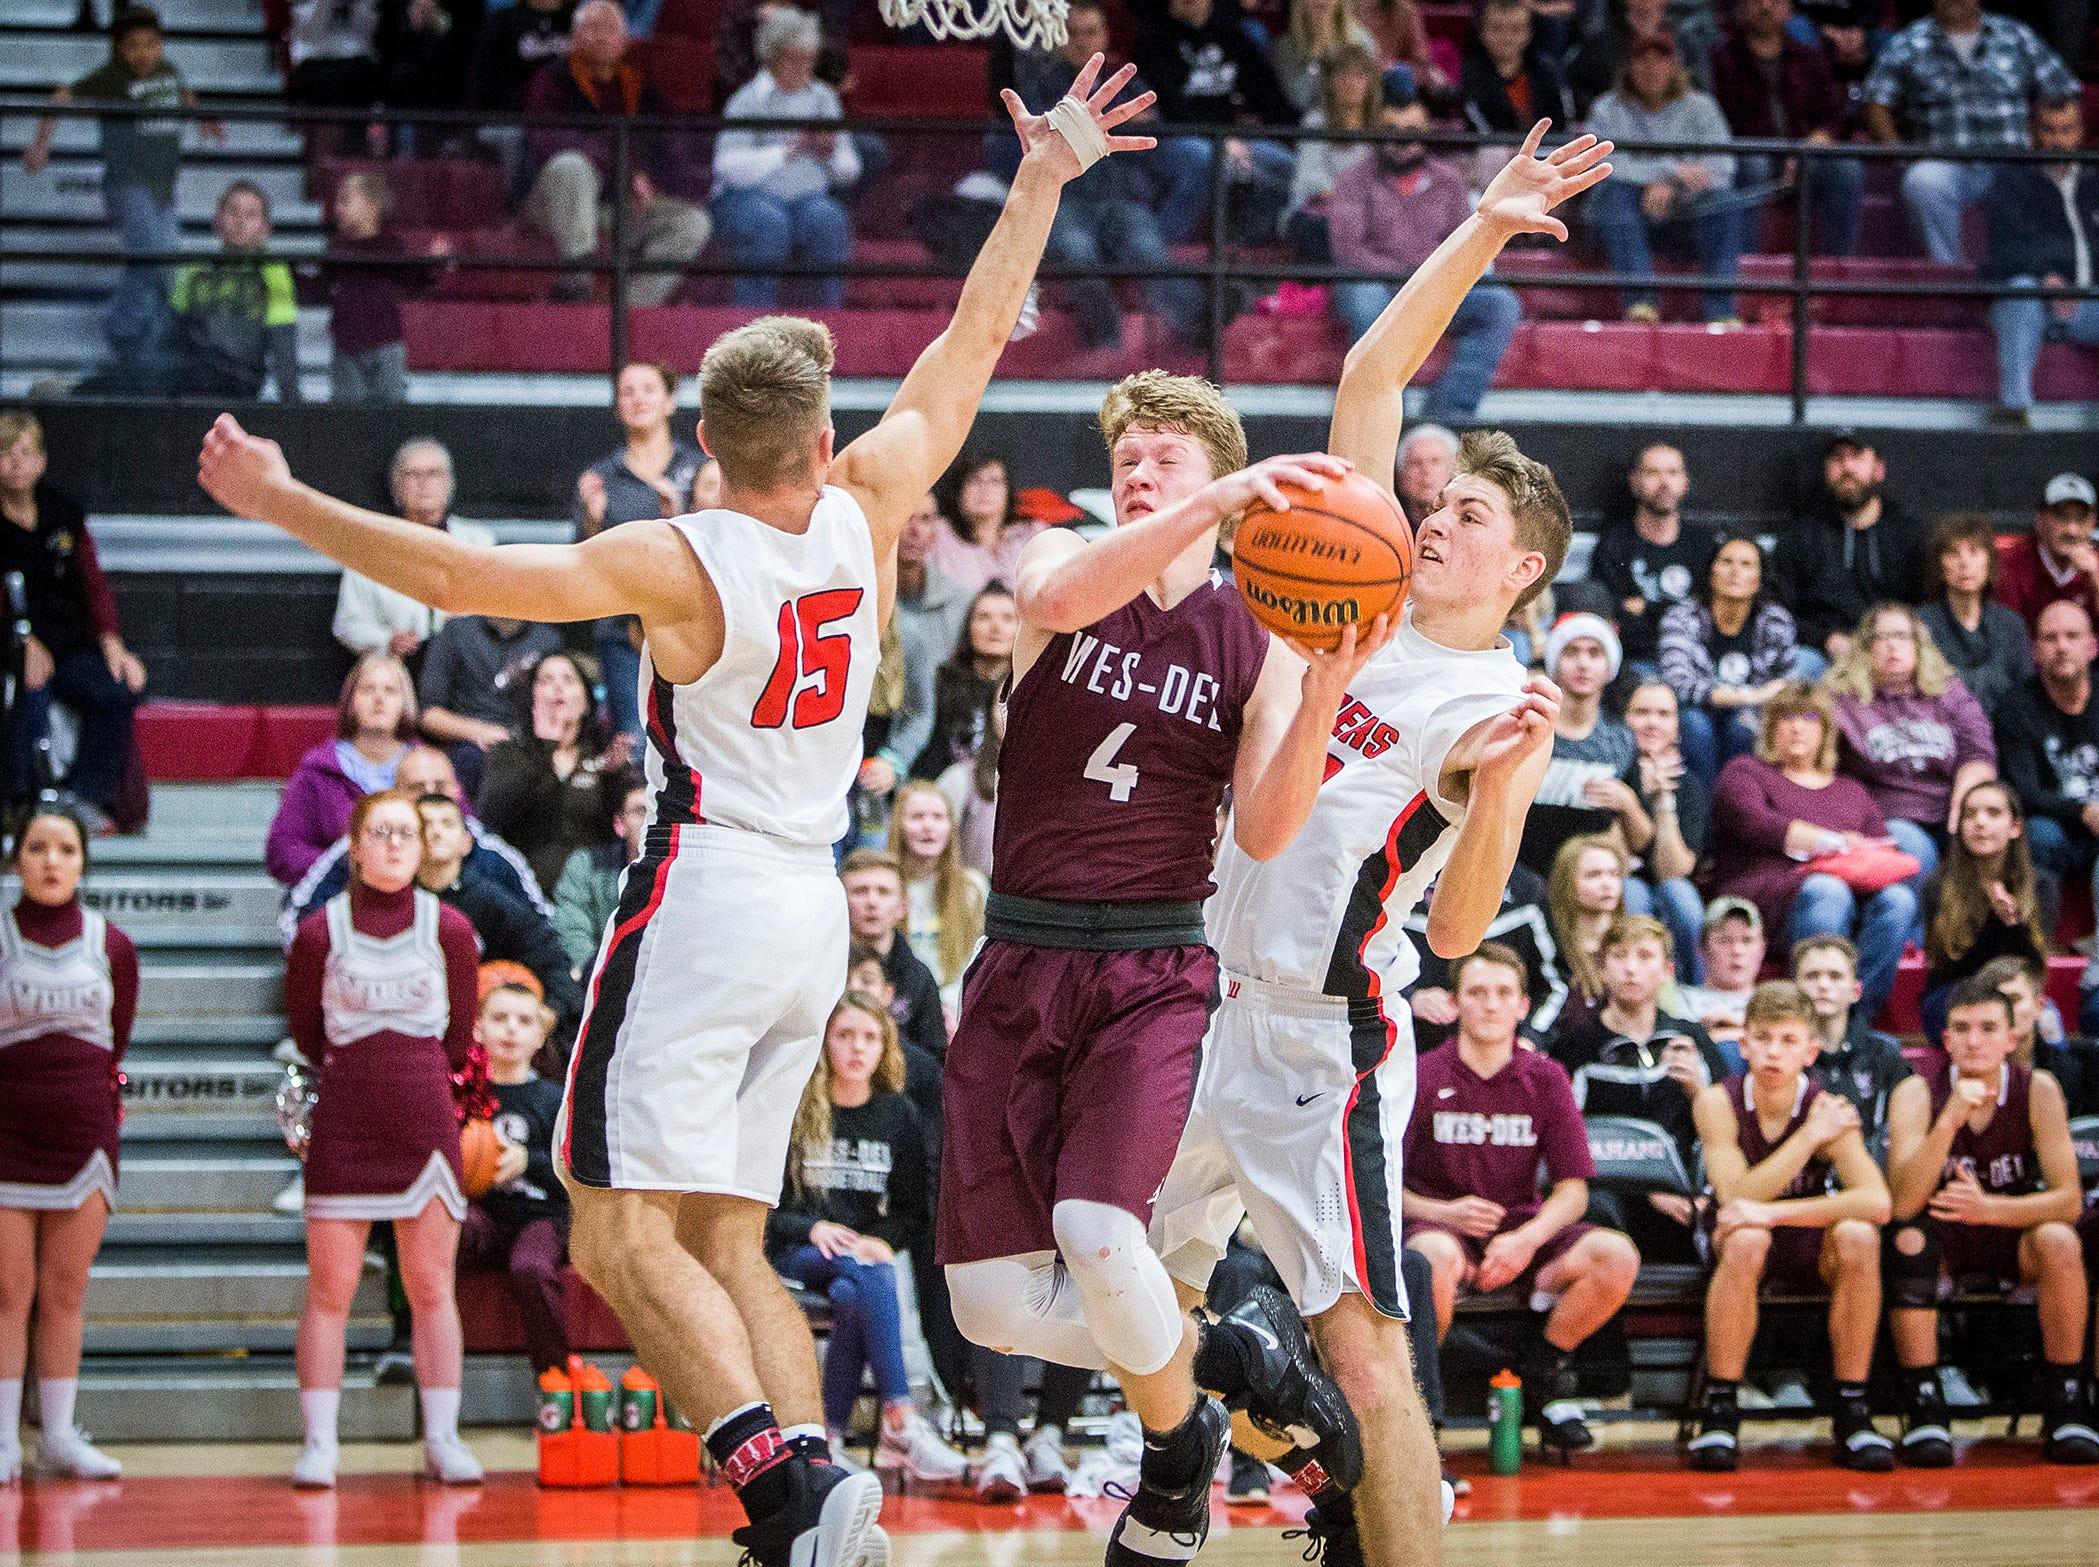 Wes-Del's Carson Ashley shoots past Wapahani's defense during their game at Wapahani High School Friday, Dec. 14, 2018.